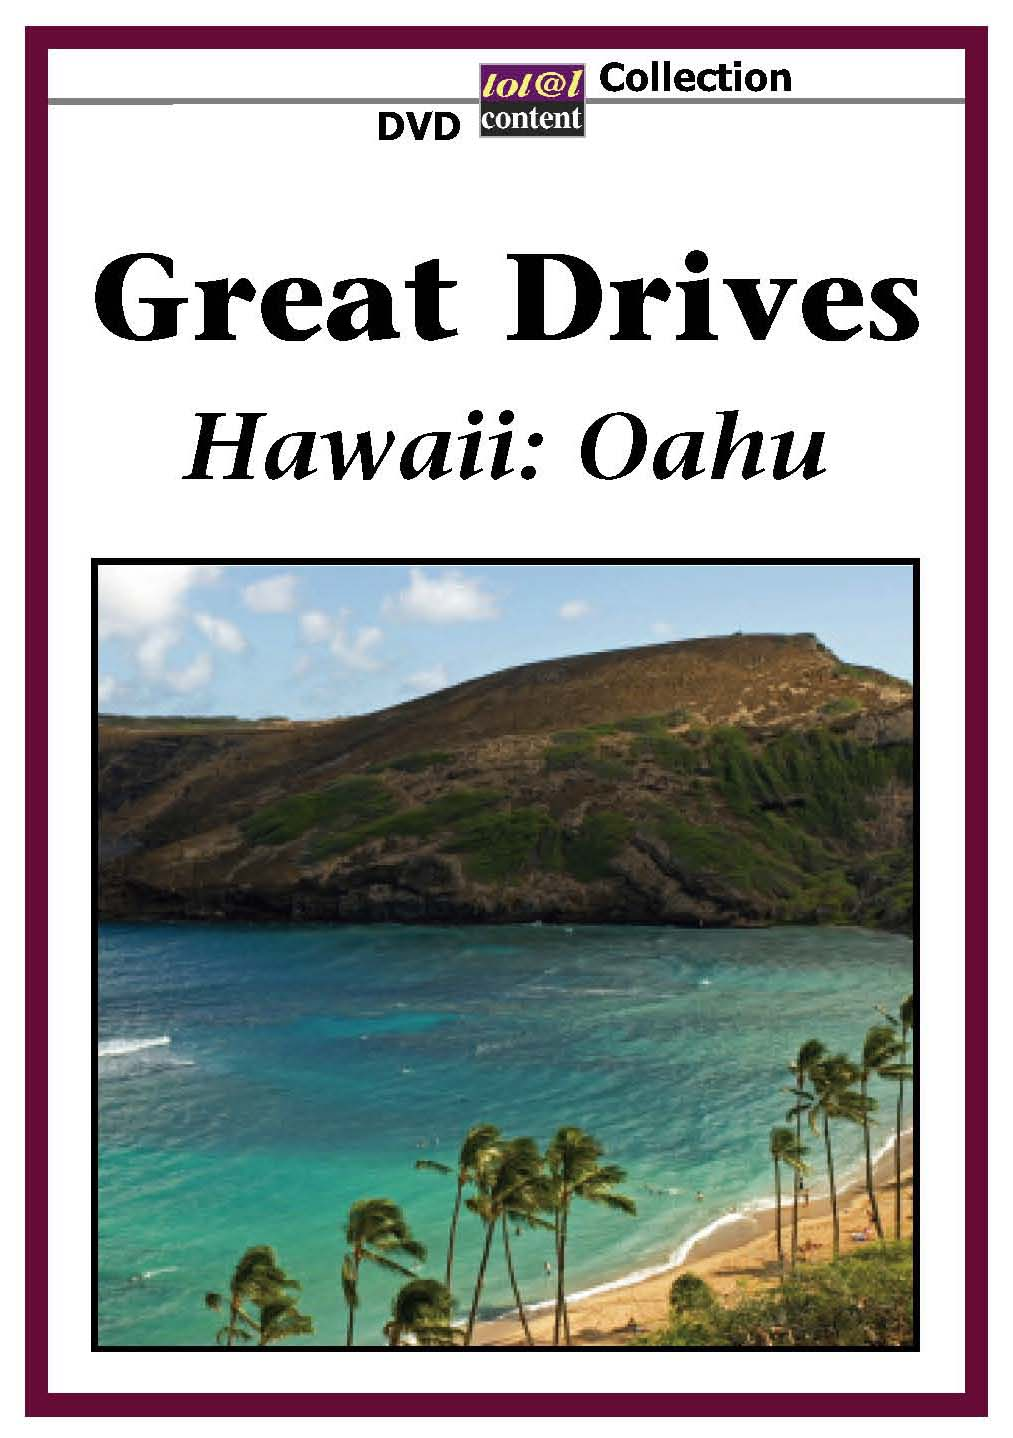 Great Drives: Hawaii - Oahu